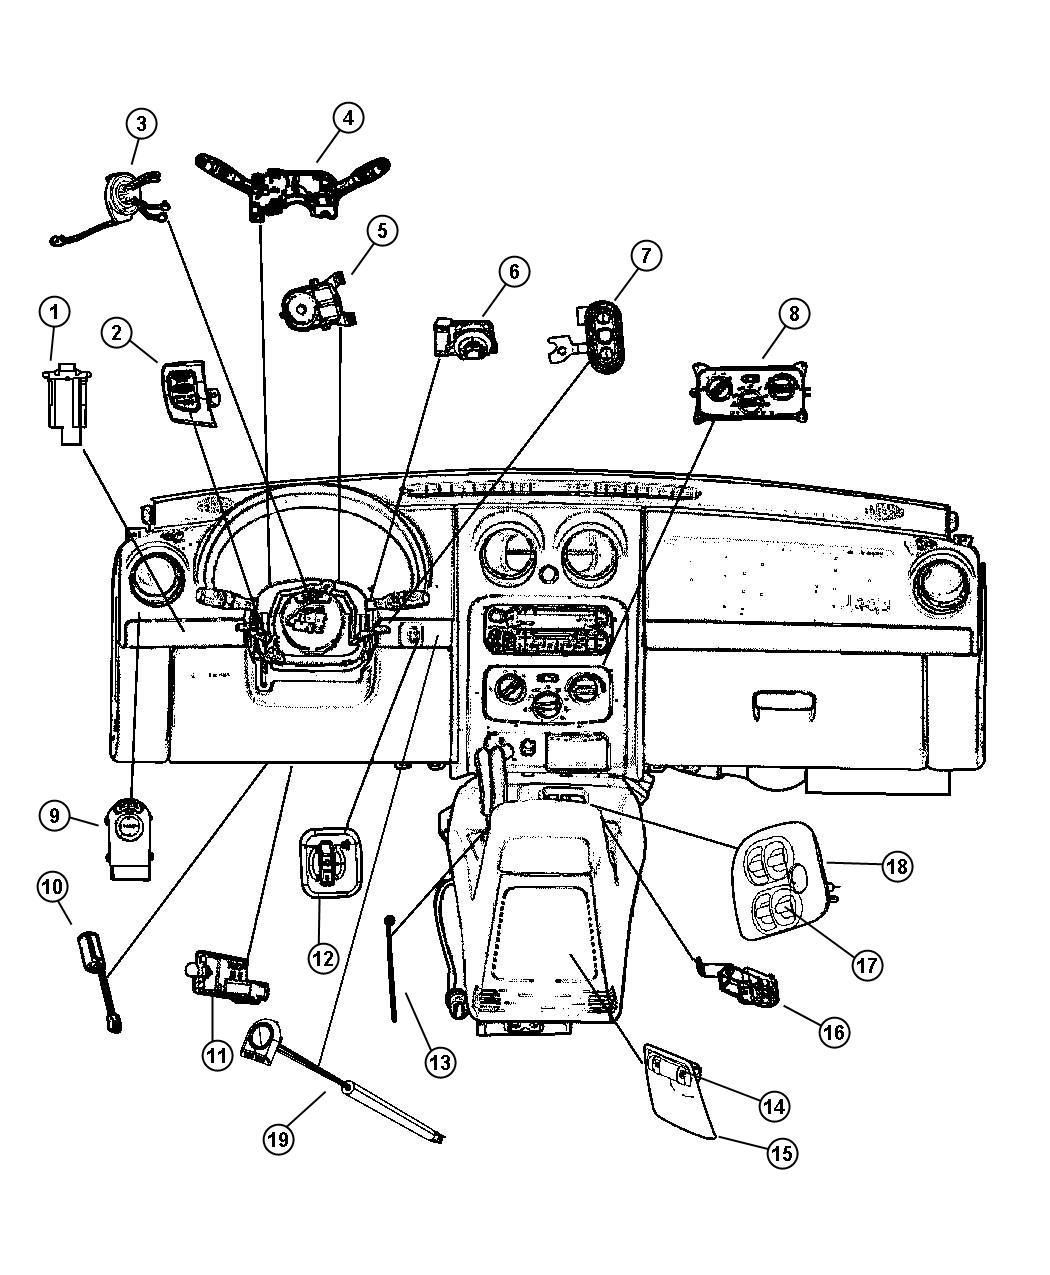 Jeep Liberty Clockspring Program Stability